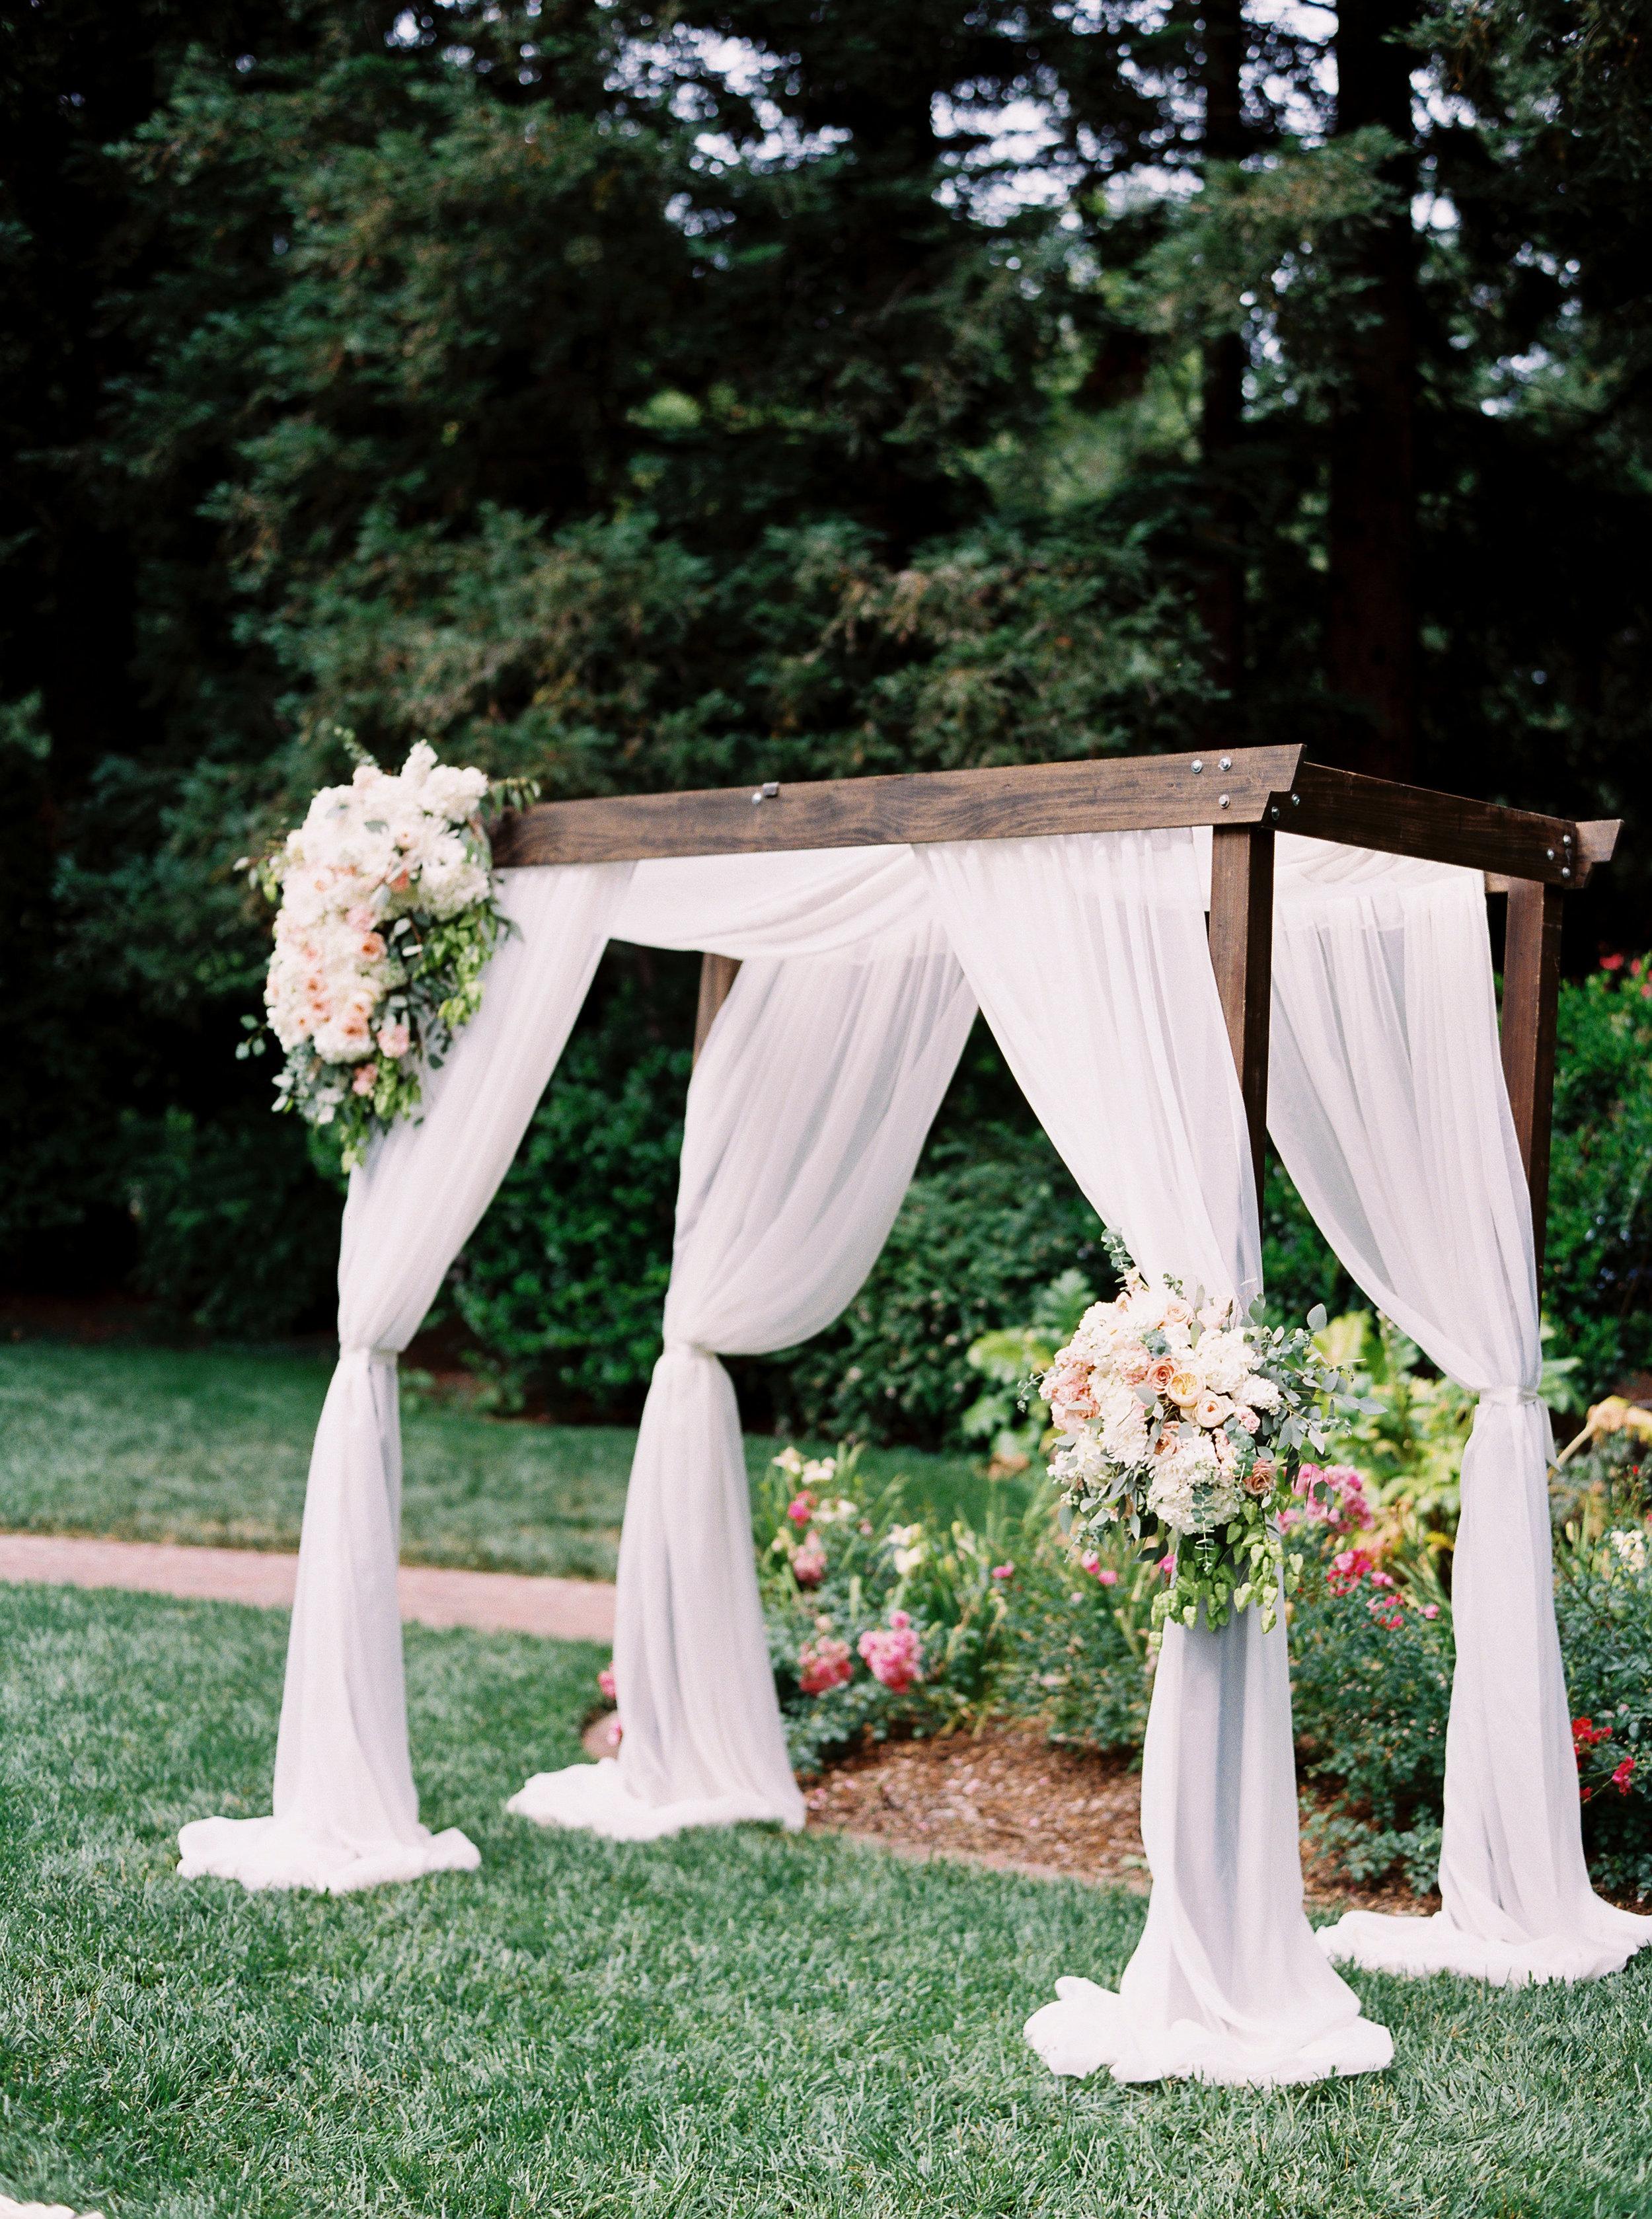 Harvest-inn-wedding-in-napa-california-8.jpg